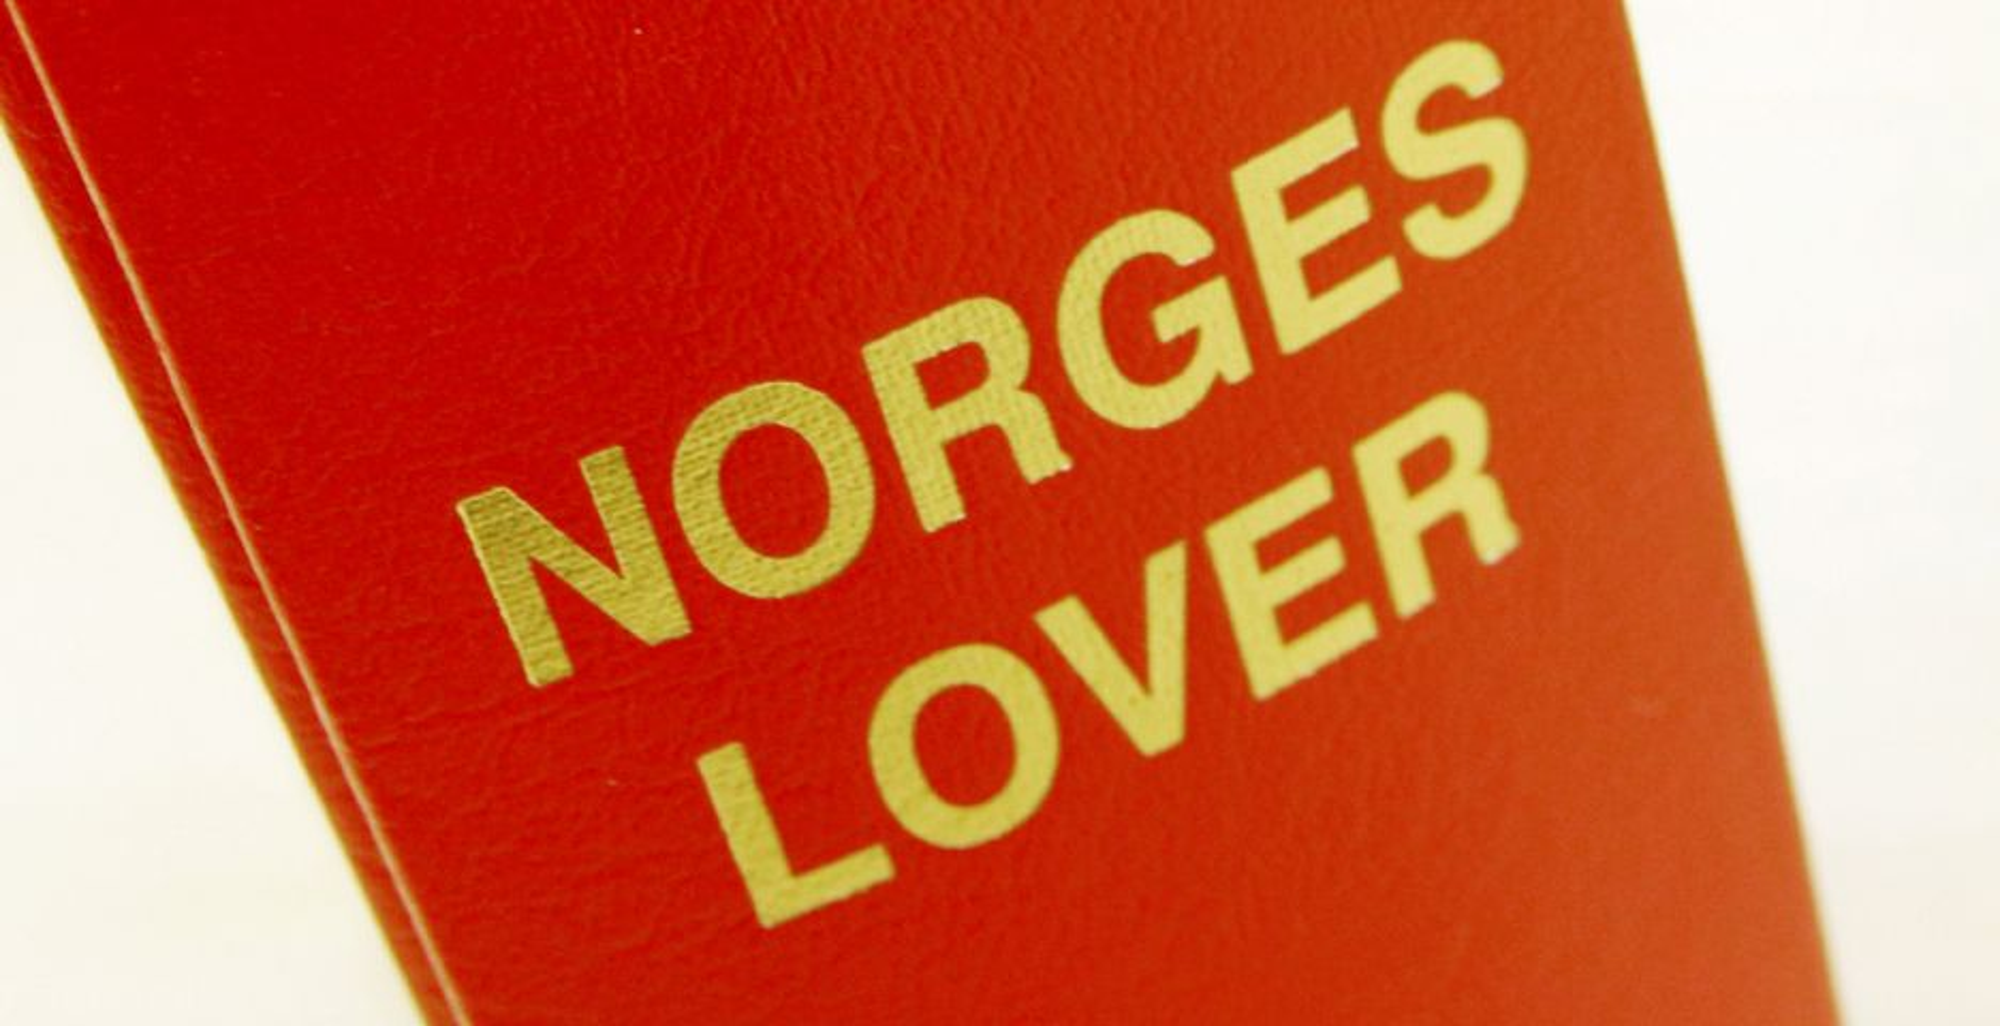 Norges lover. Lovbok. Lovsamling. Regler. Juss. Juridisk. Retten. Rettssak. Rettssal. Forskrifter. Kommune. Kommunal.